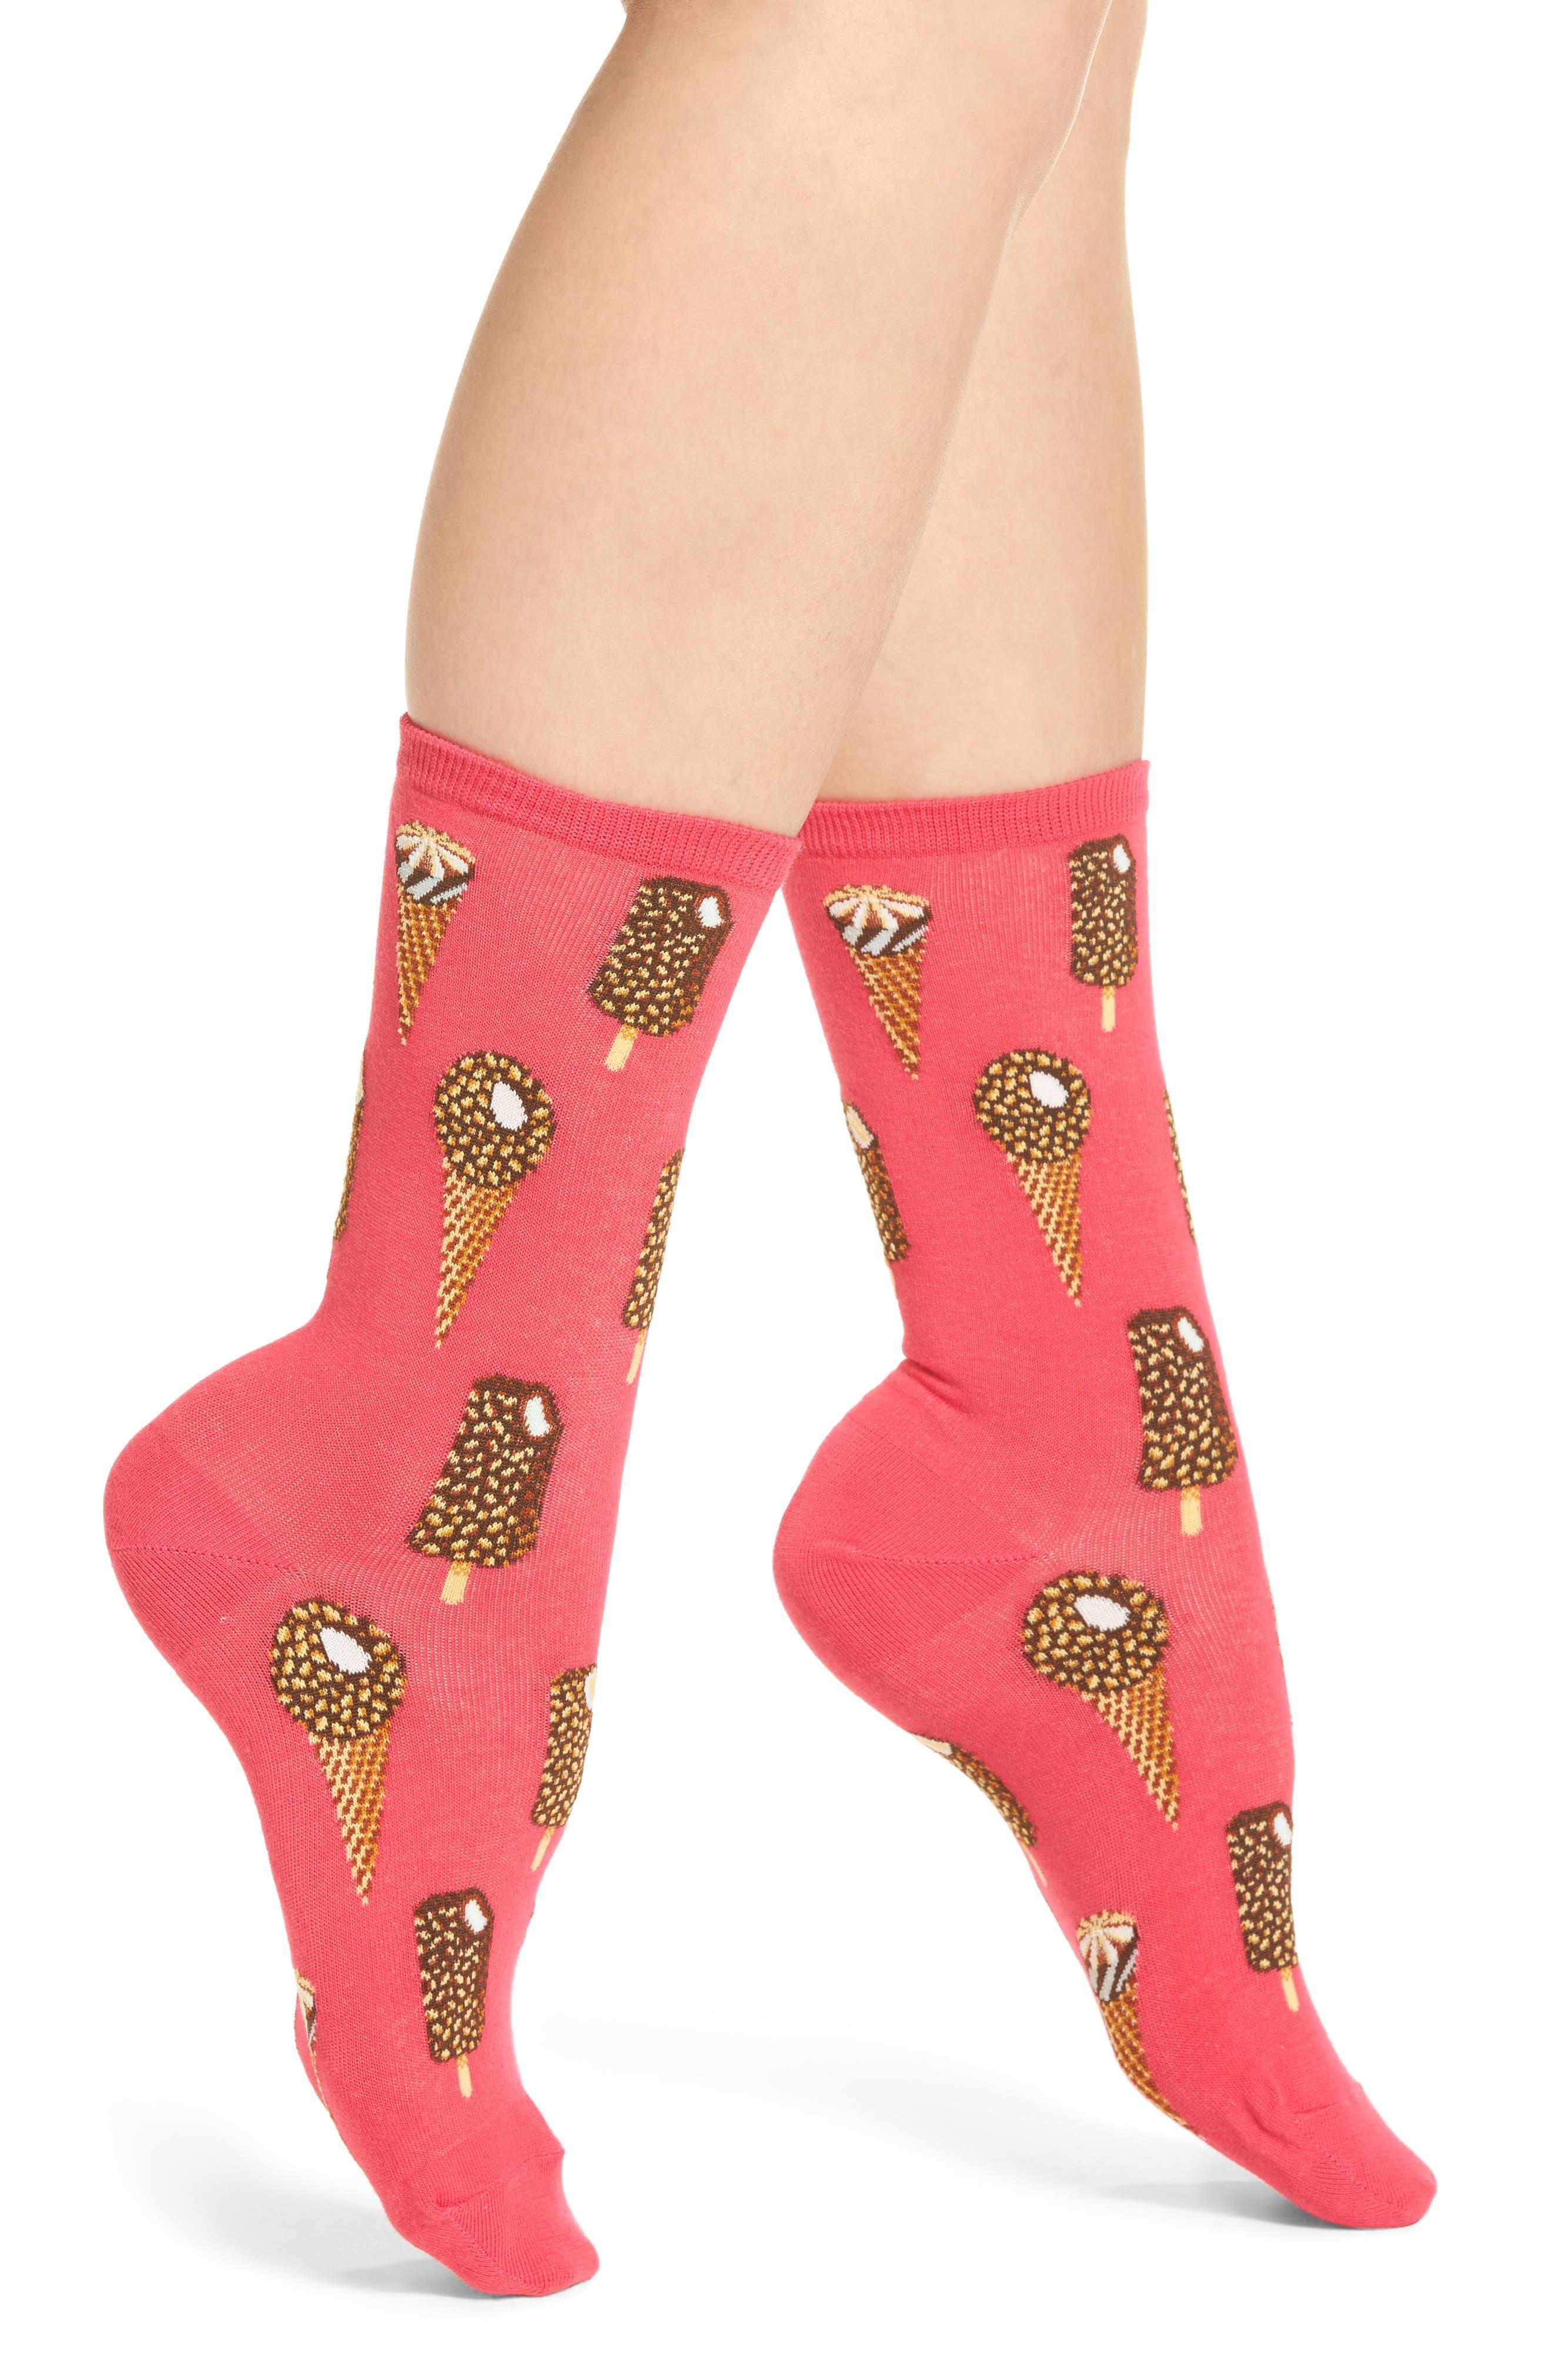 Hot Sox Ice Cream Crew Socks (3 for $15)